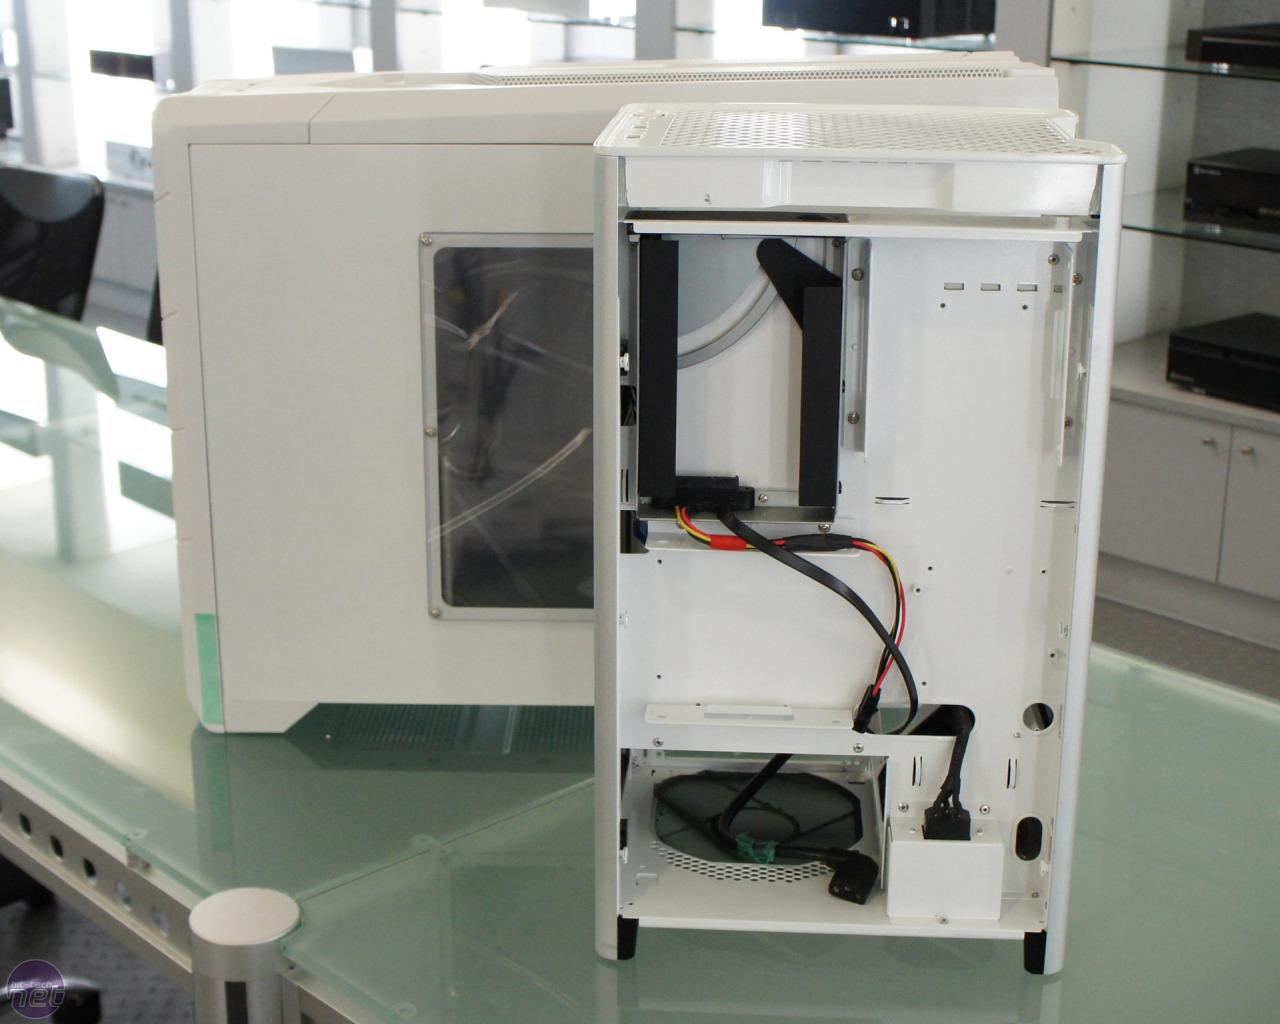 Clean slot loading optical drive